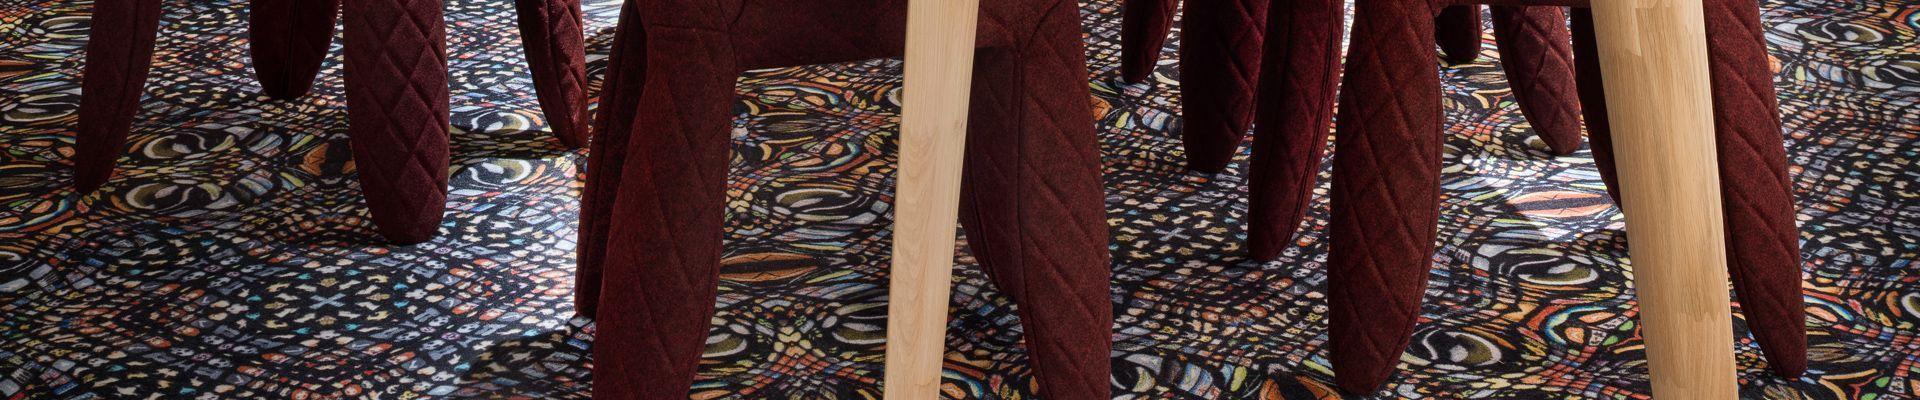 Moooi Carpets Dazzling Dialogues